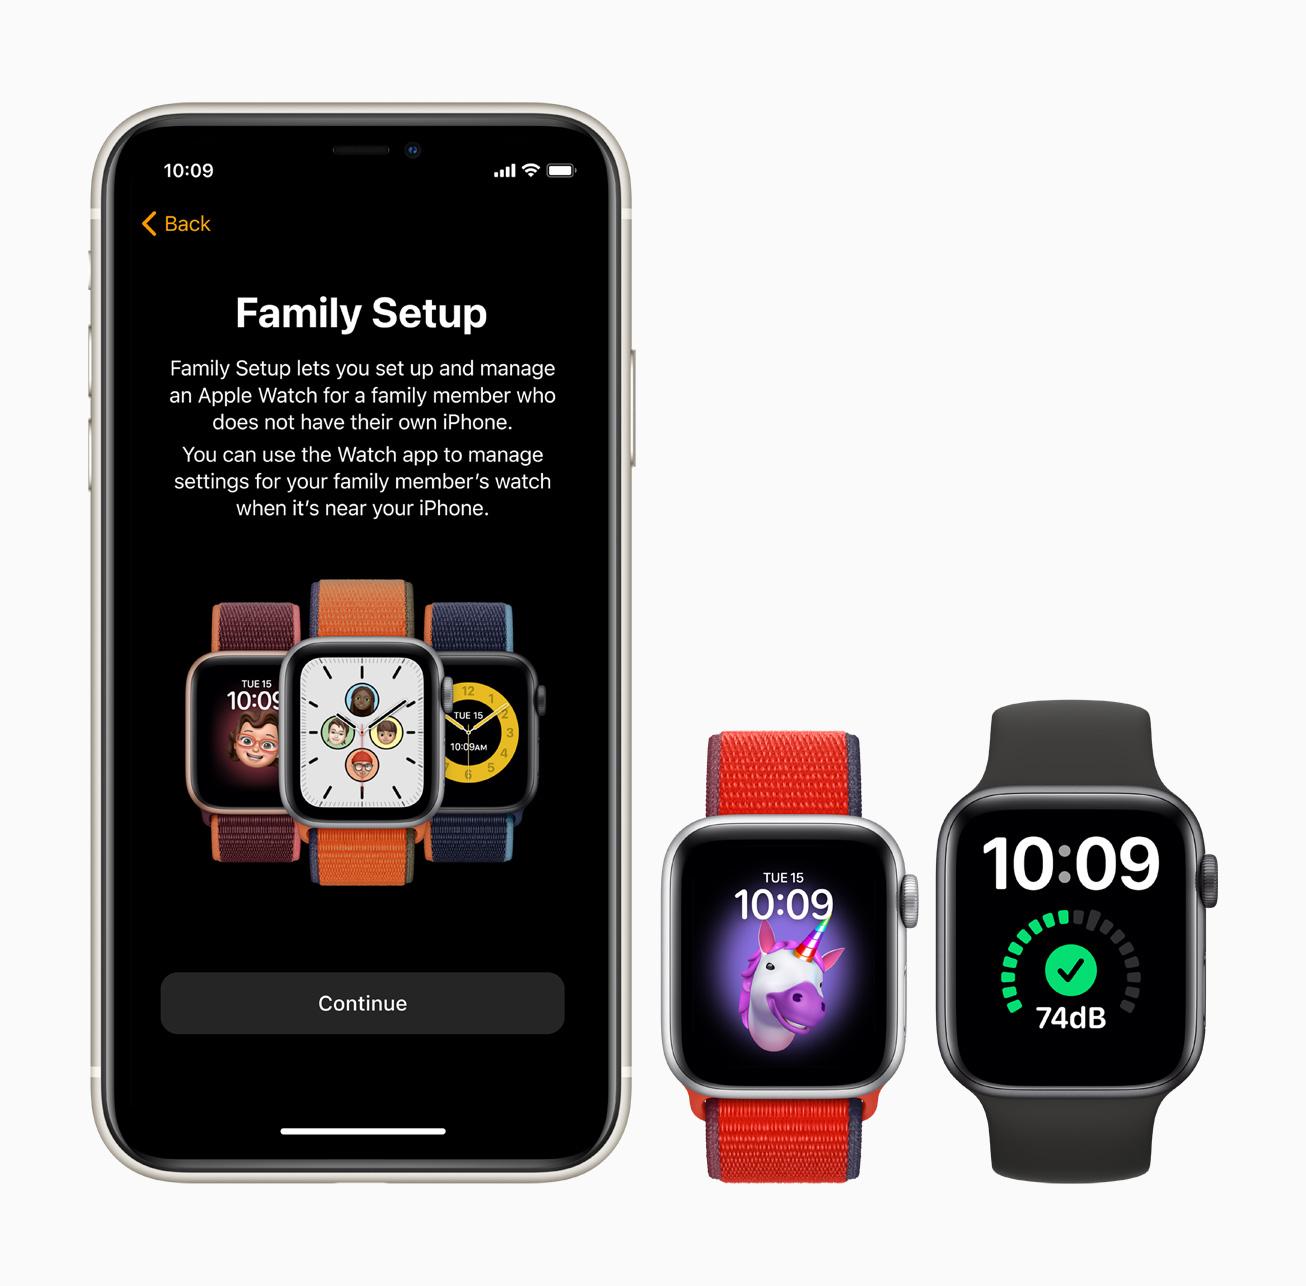 Apple_watch-family-setup-iphone11-screen_09152020.jpg